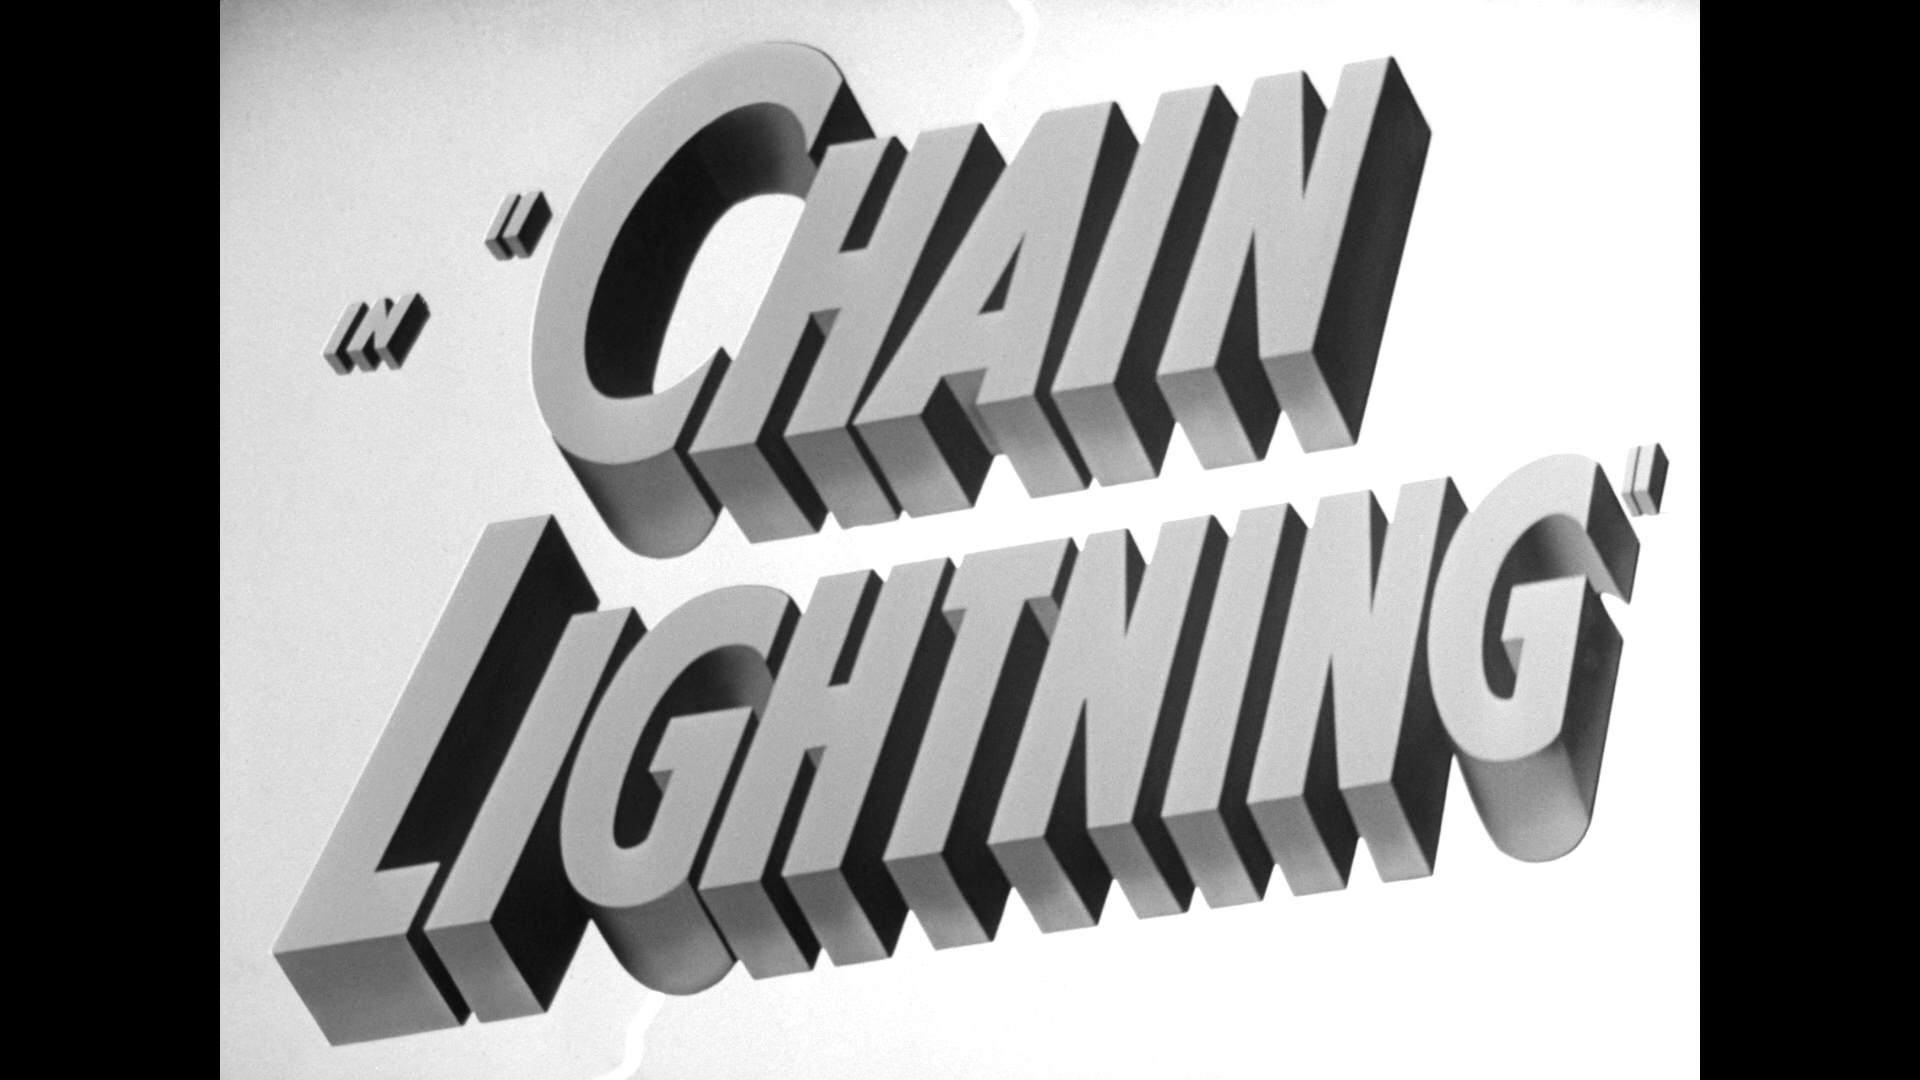 chain lightning warner archive title